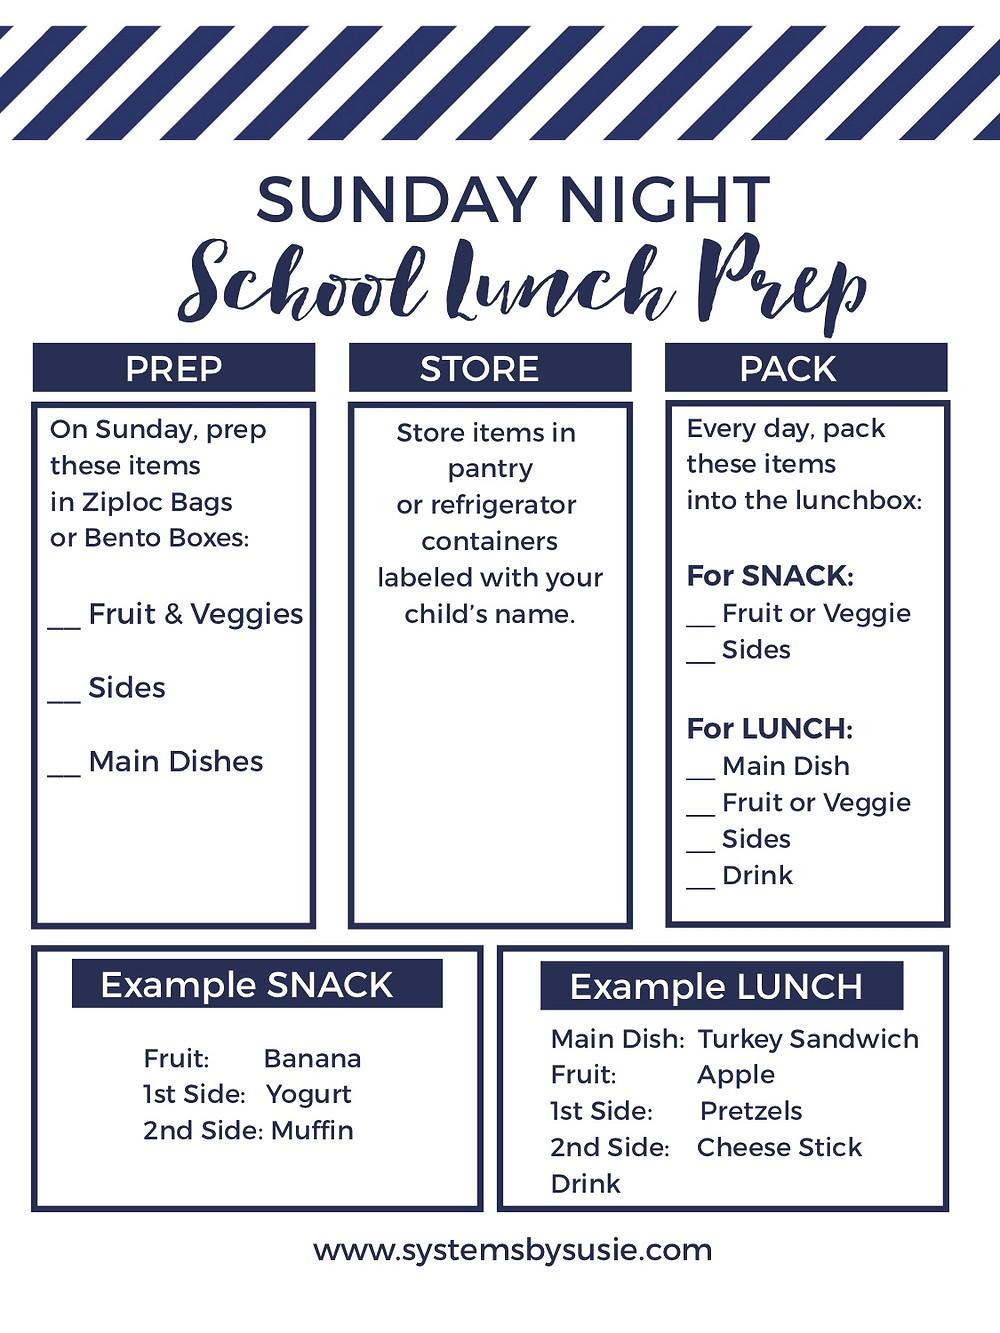 Sunday Night School Lunch Prep Handout